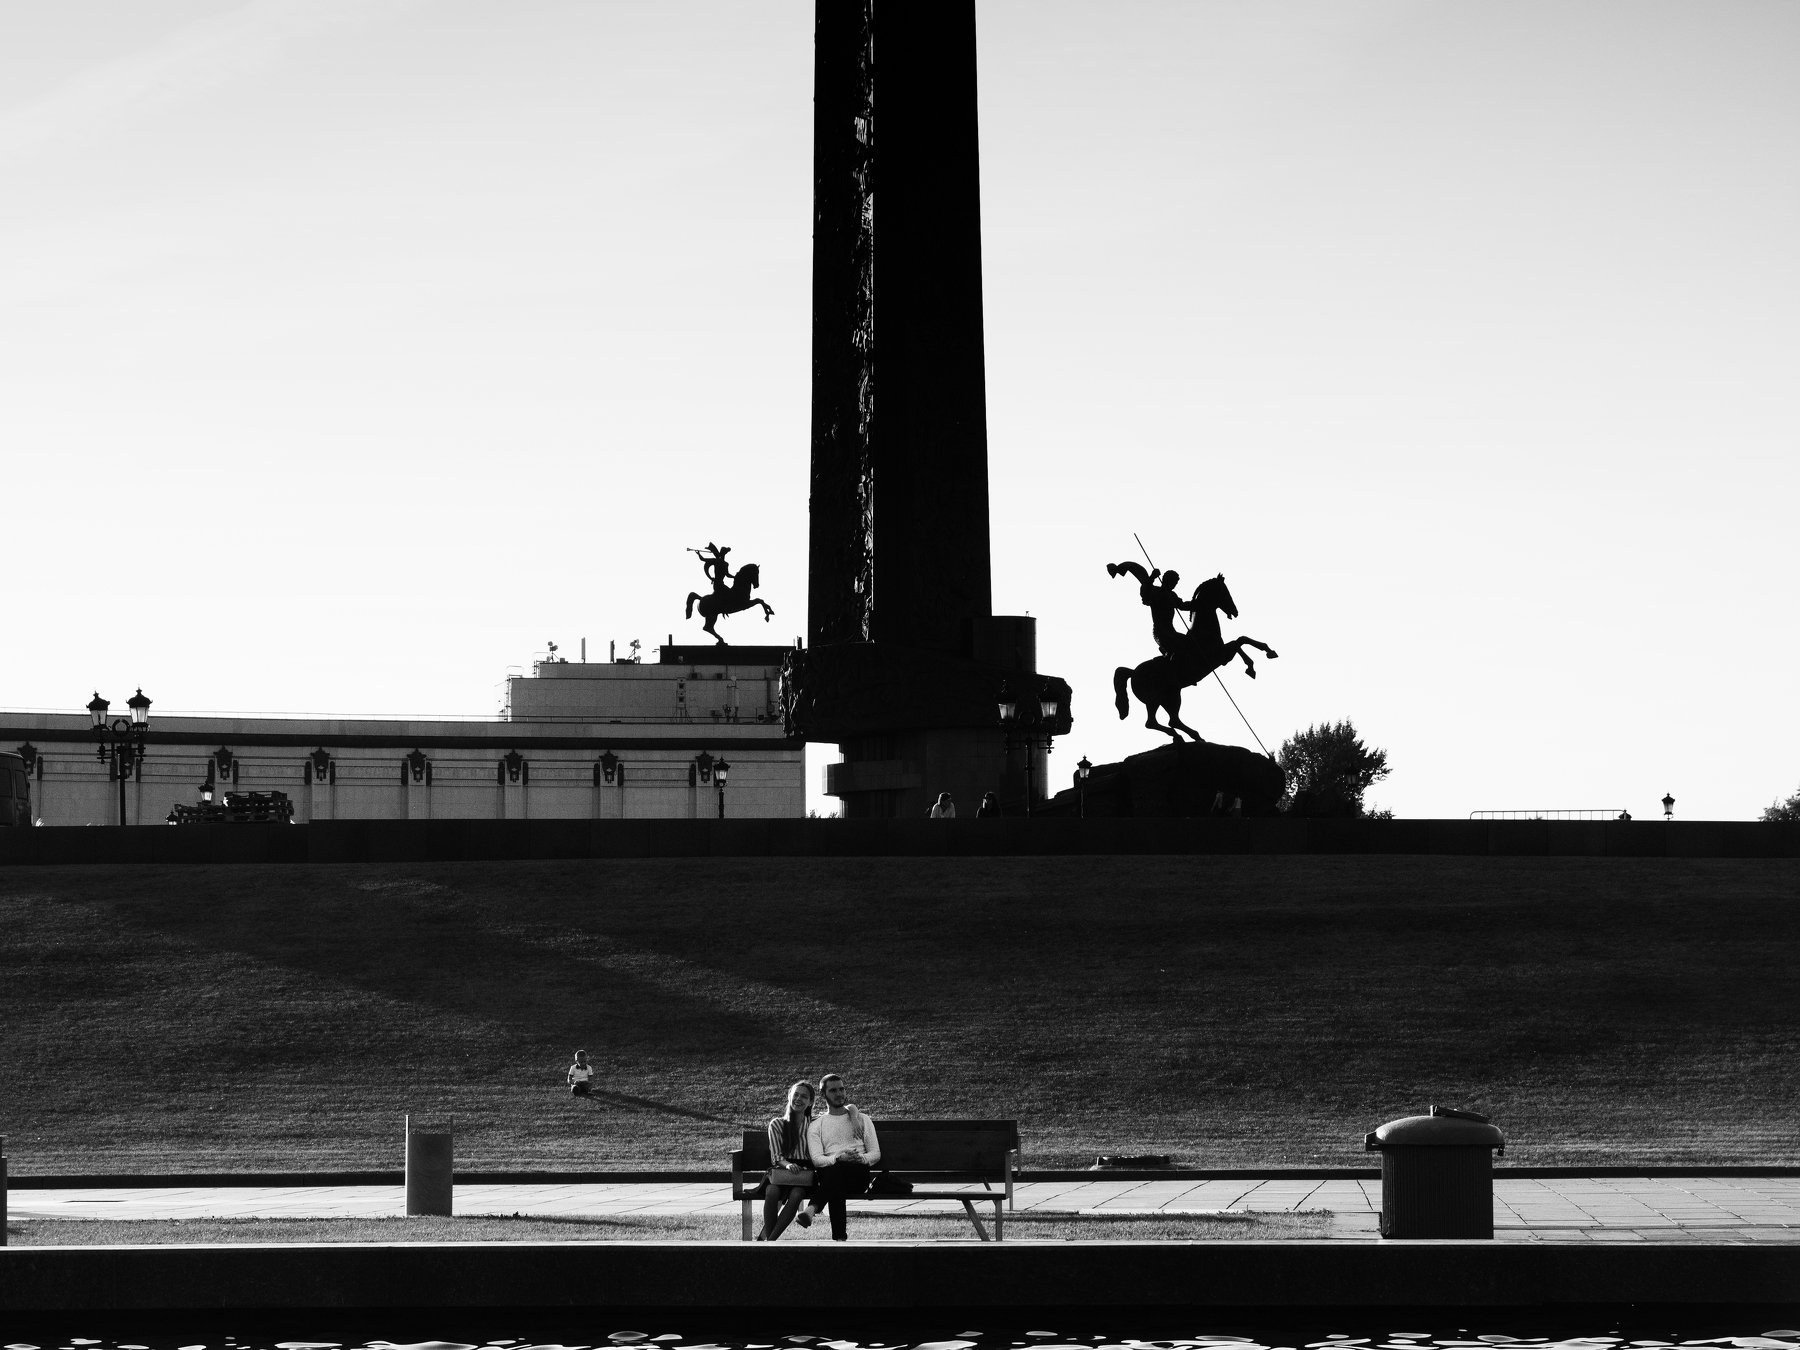 Moscow, Russia, Park, Black and white, Leisure, Monochrome, Street, Elena Beregatnova